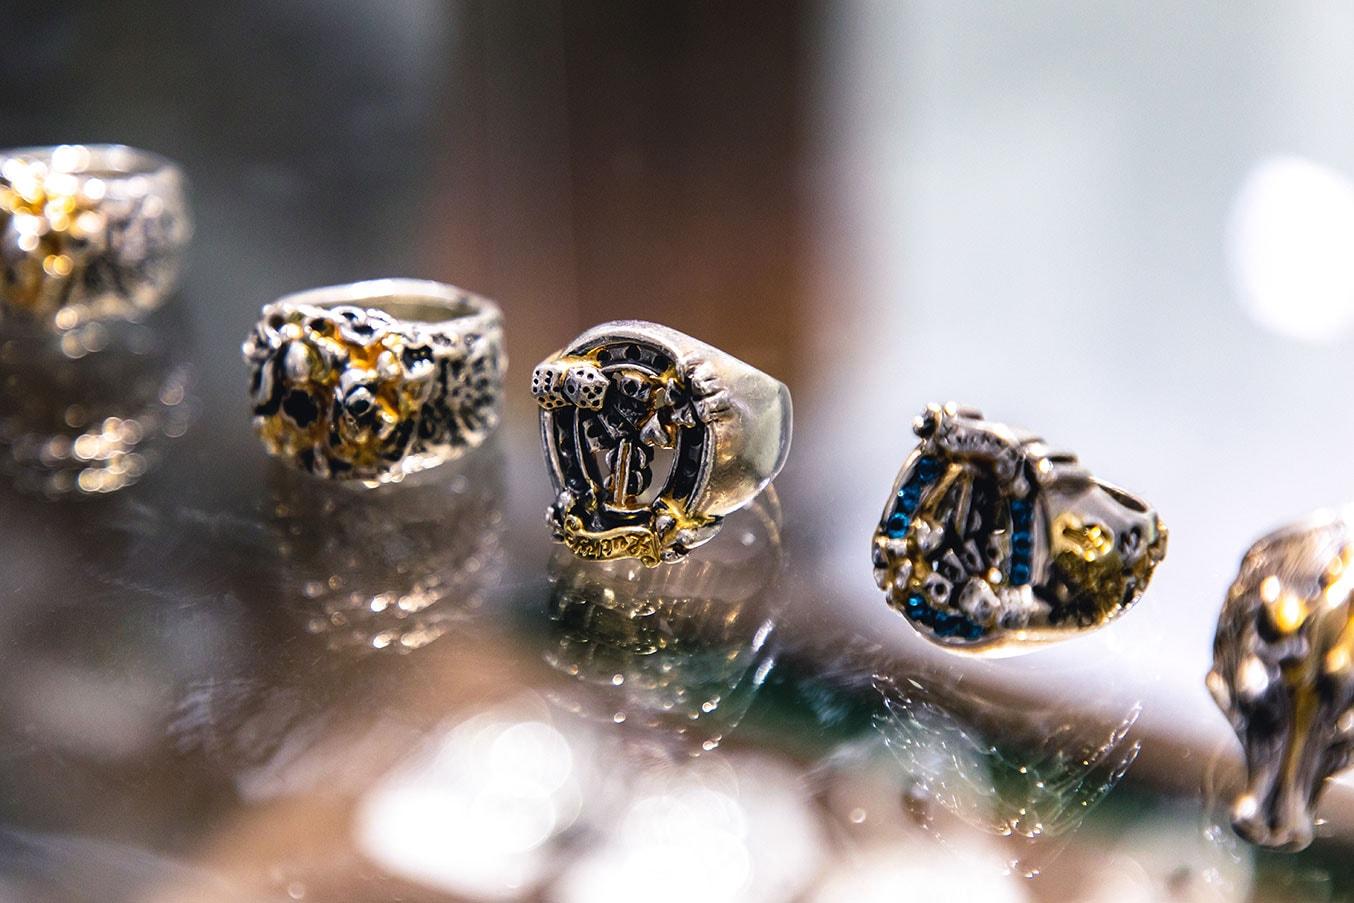 Bill Wall Leather Silver Jewelry Interview skulls vinavast Malibu silversmith Hong Kong Skulls Gold Diamond Smiley Face Silver 925 accessories rings bracelets bangles earrings